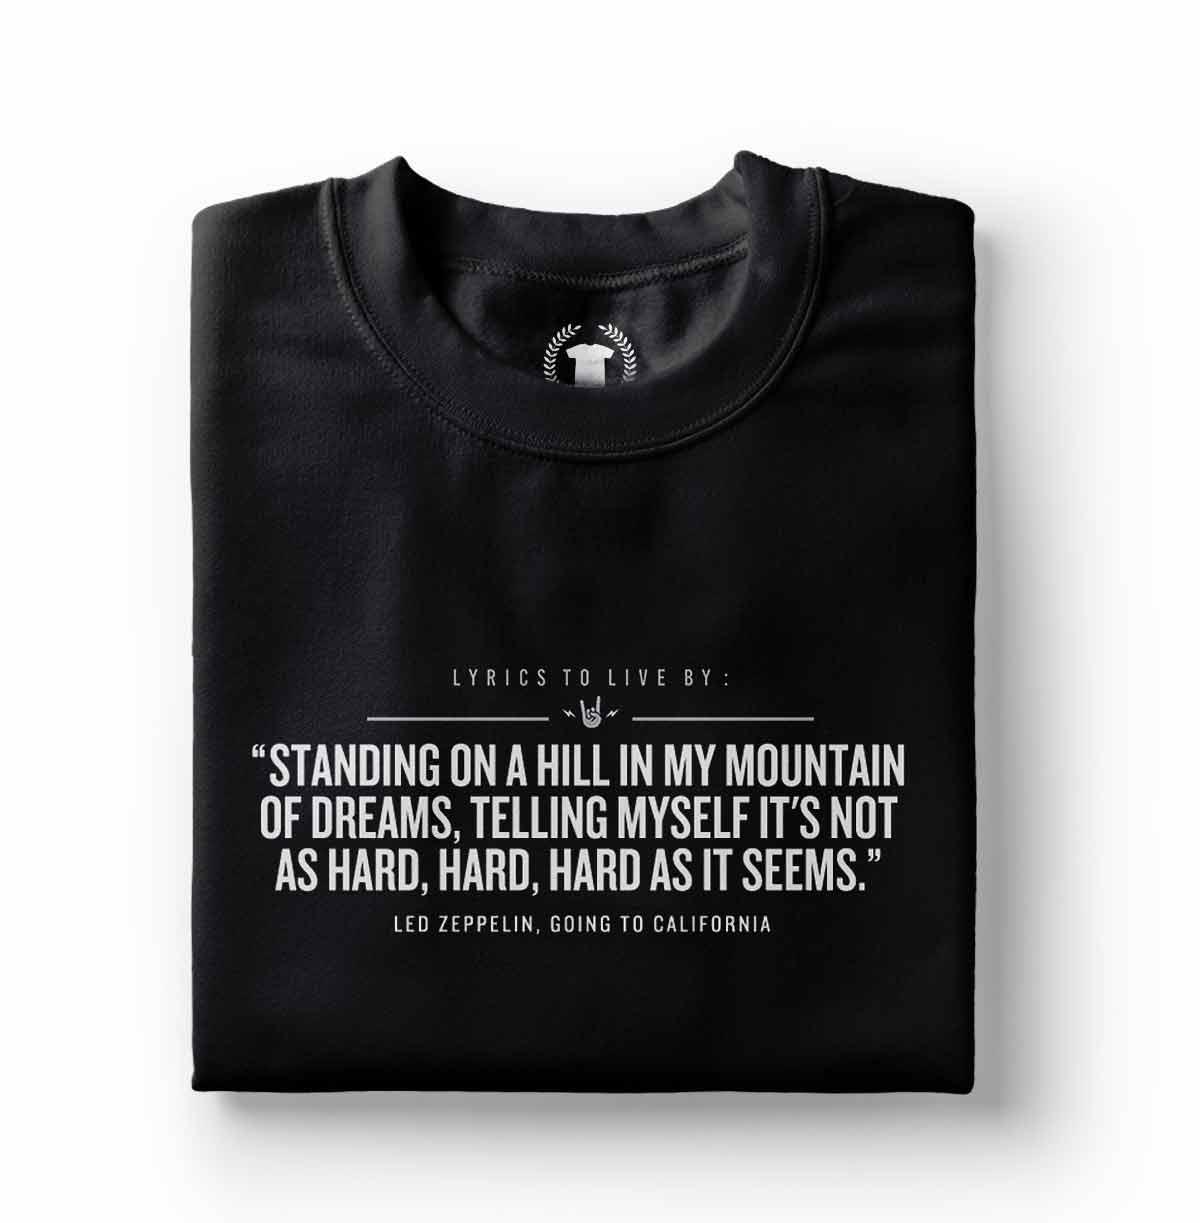 camiseta led zeppelin goin to california